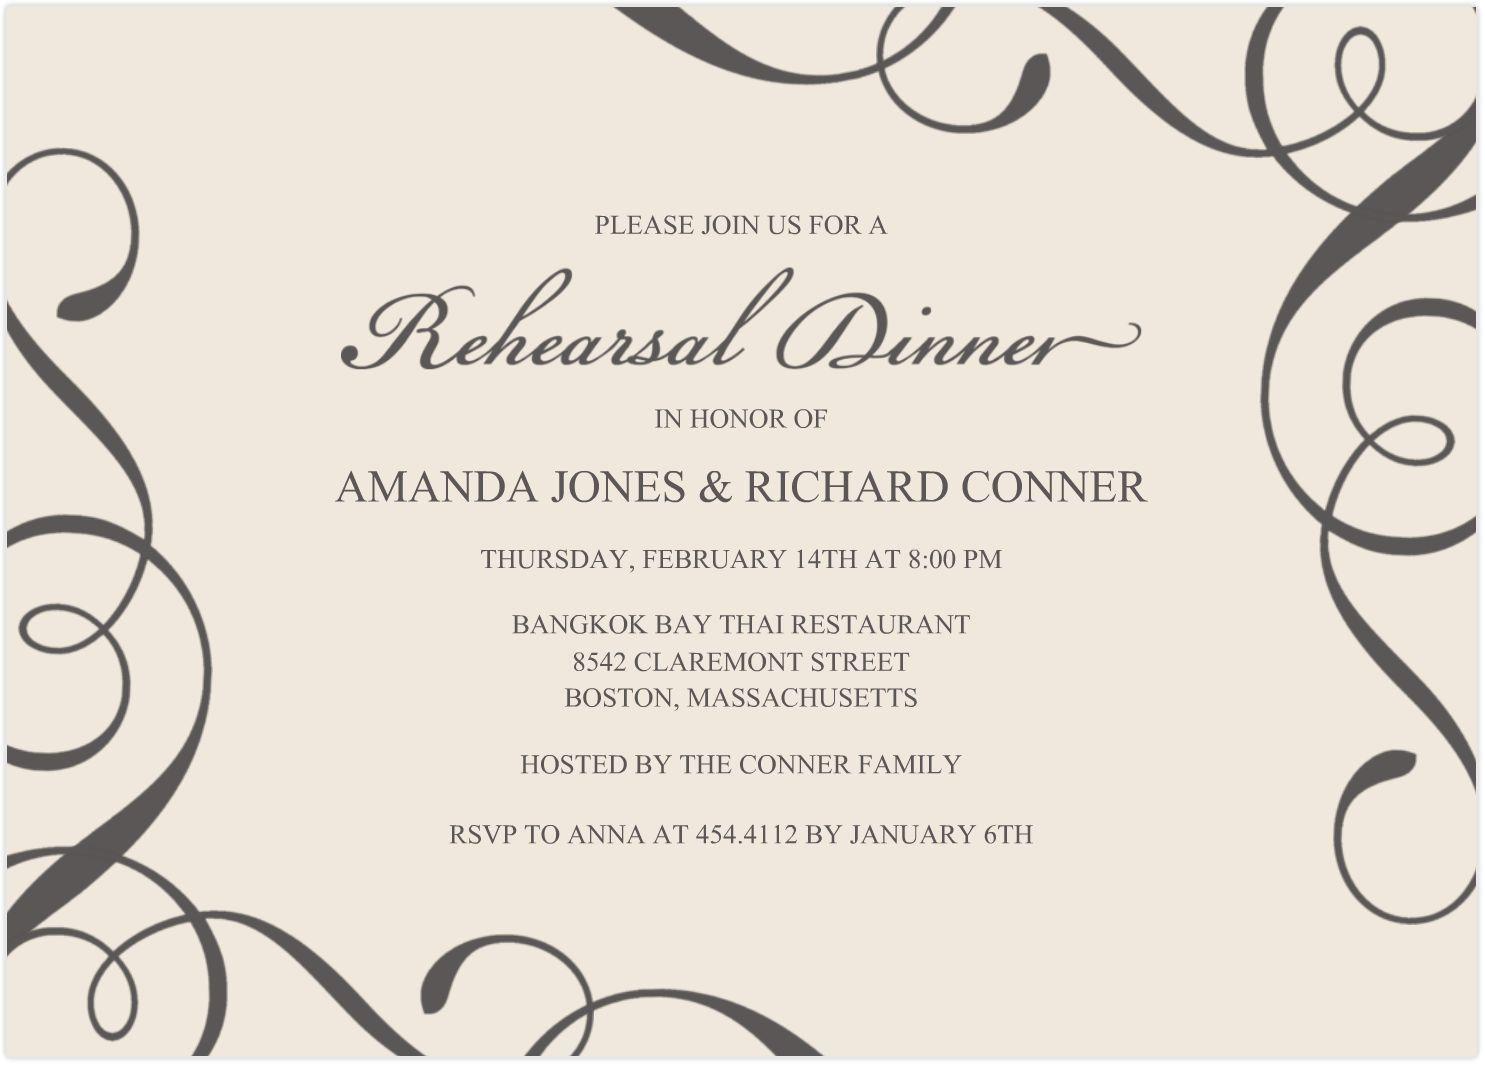 dinner invitation templates free – Dinner Invite Templates